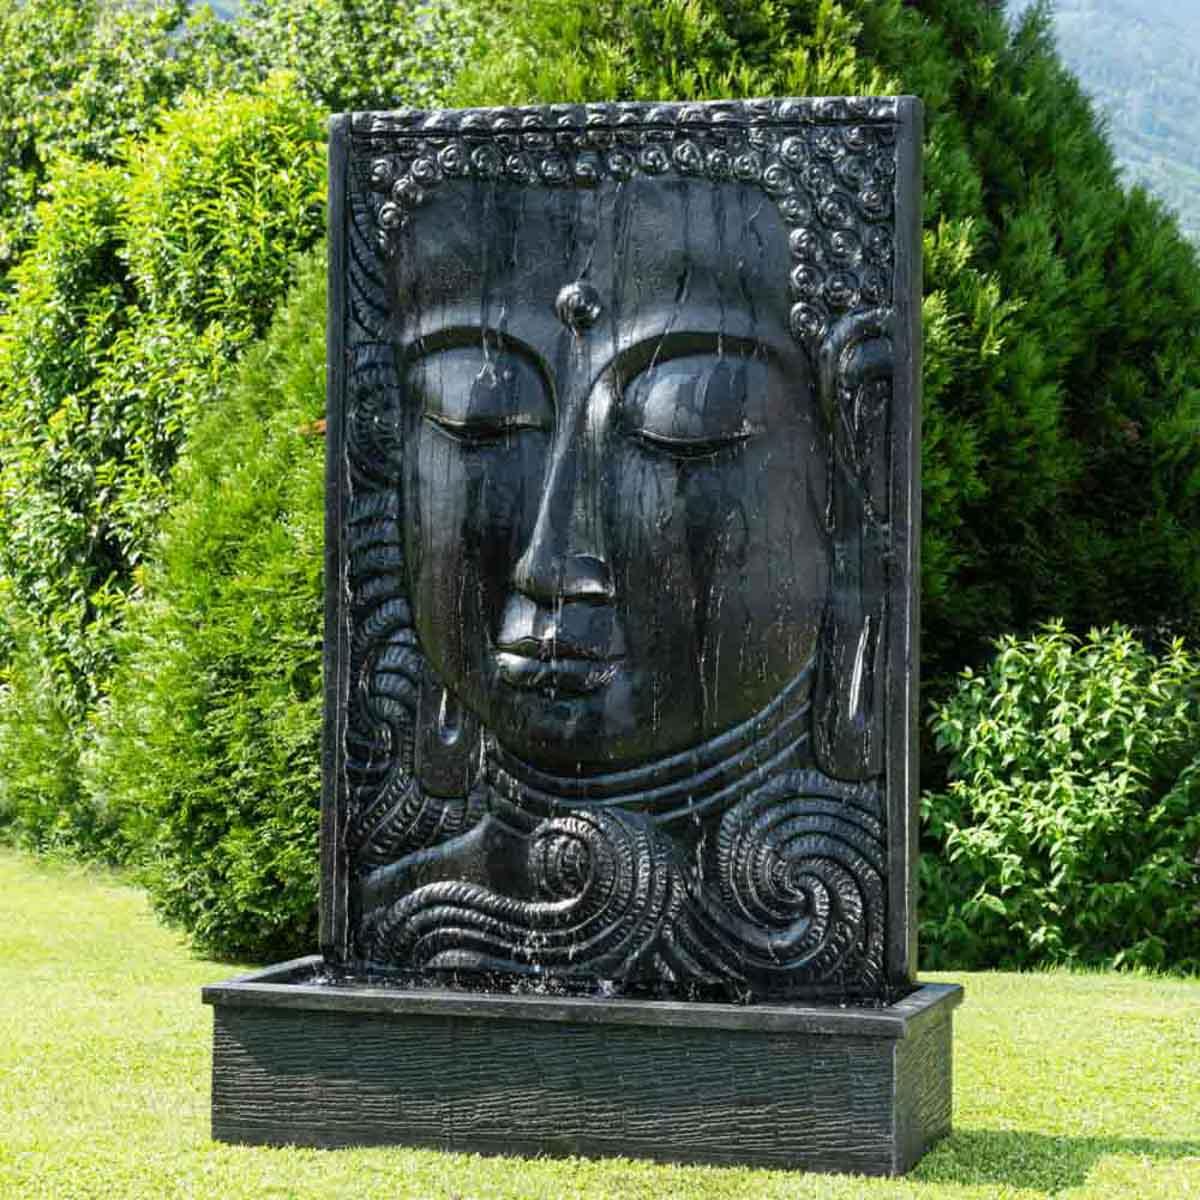 grande fontaine de jardin mur d 39 eau visage de bouddha 2m 10 noir brun. Black Bedroom Furniture Sets. Home Design Ideas